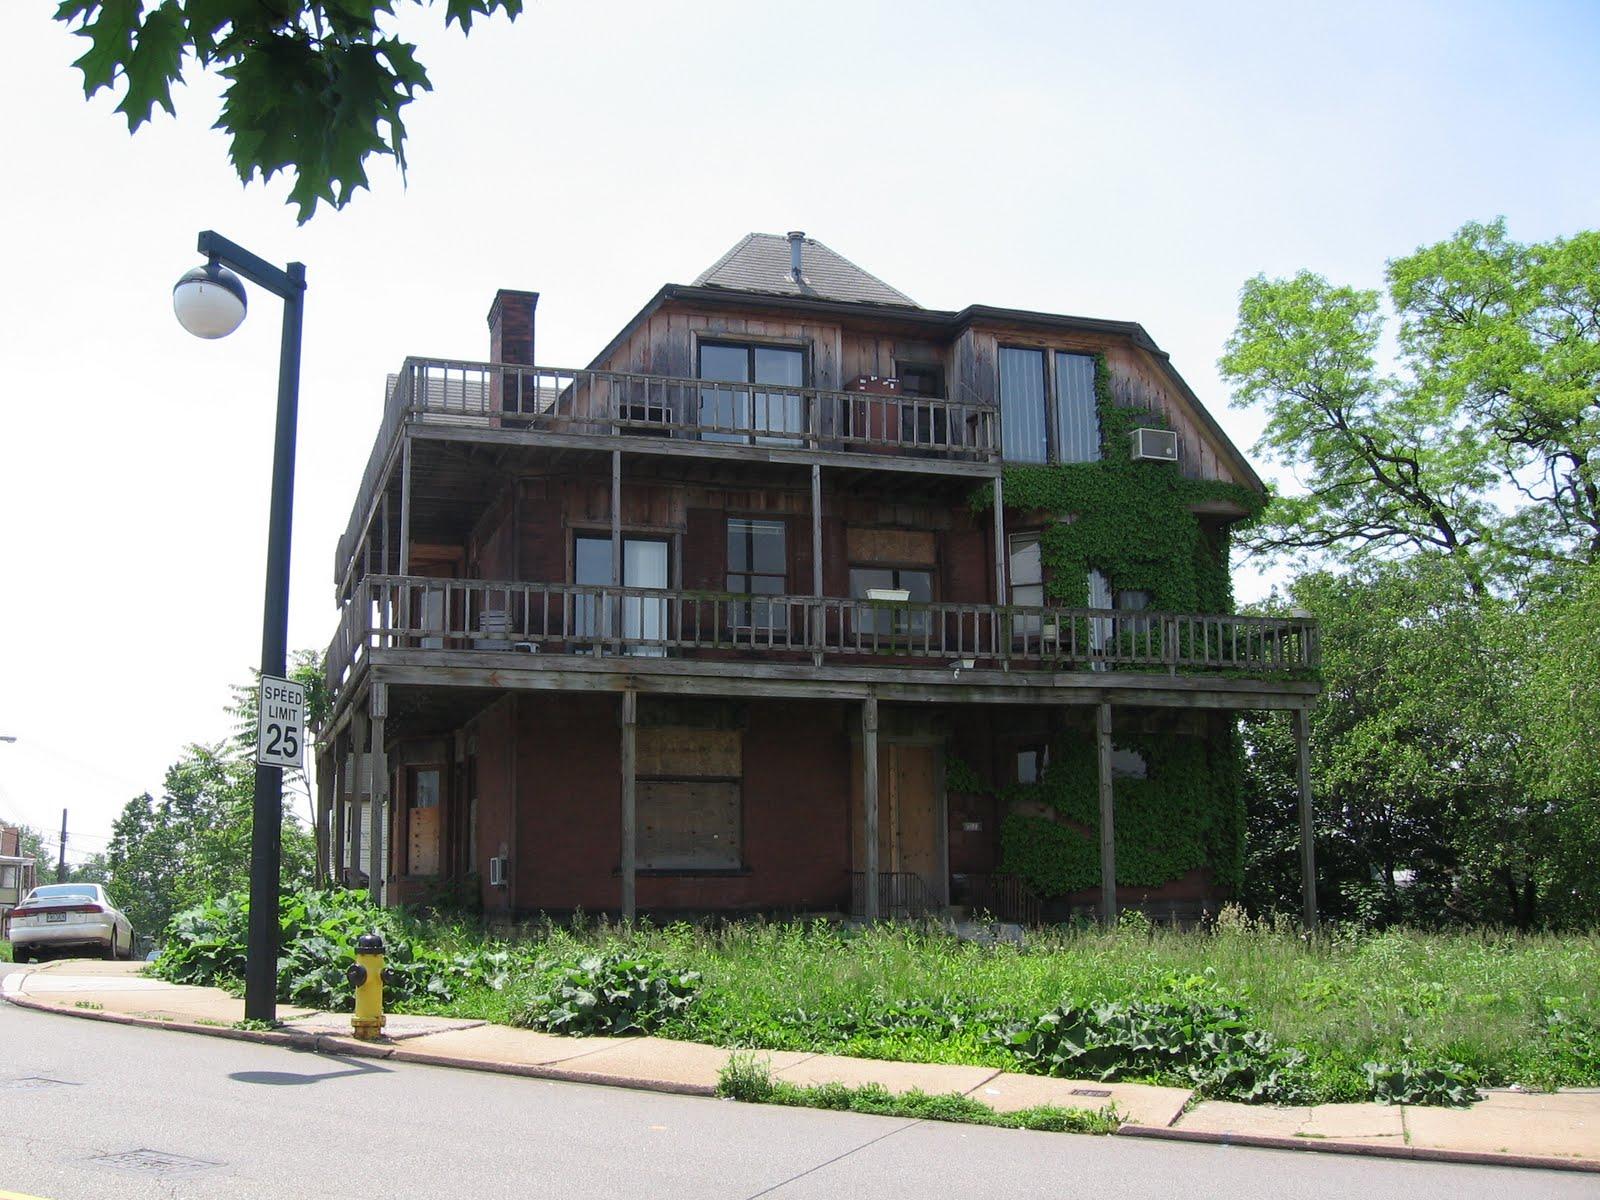 Housing on Mount Washington 2006